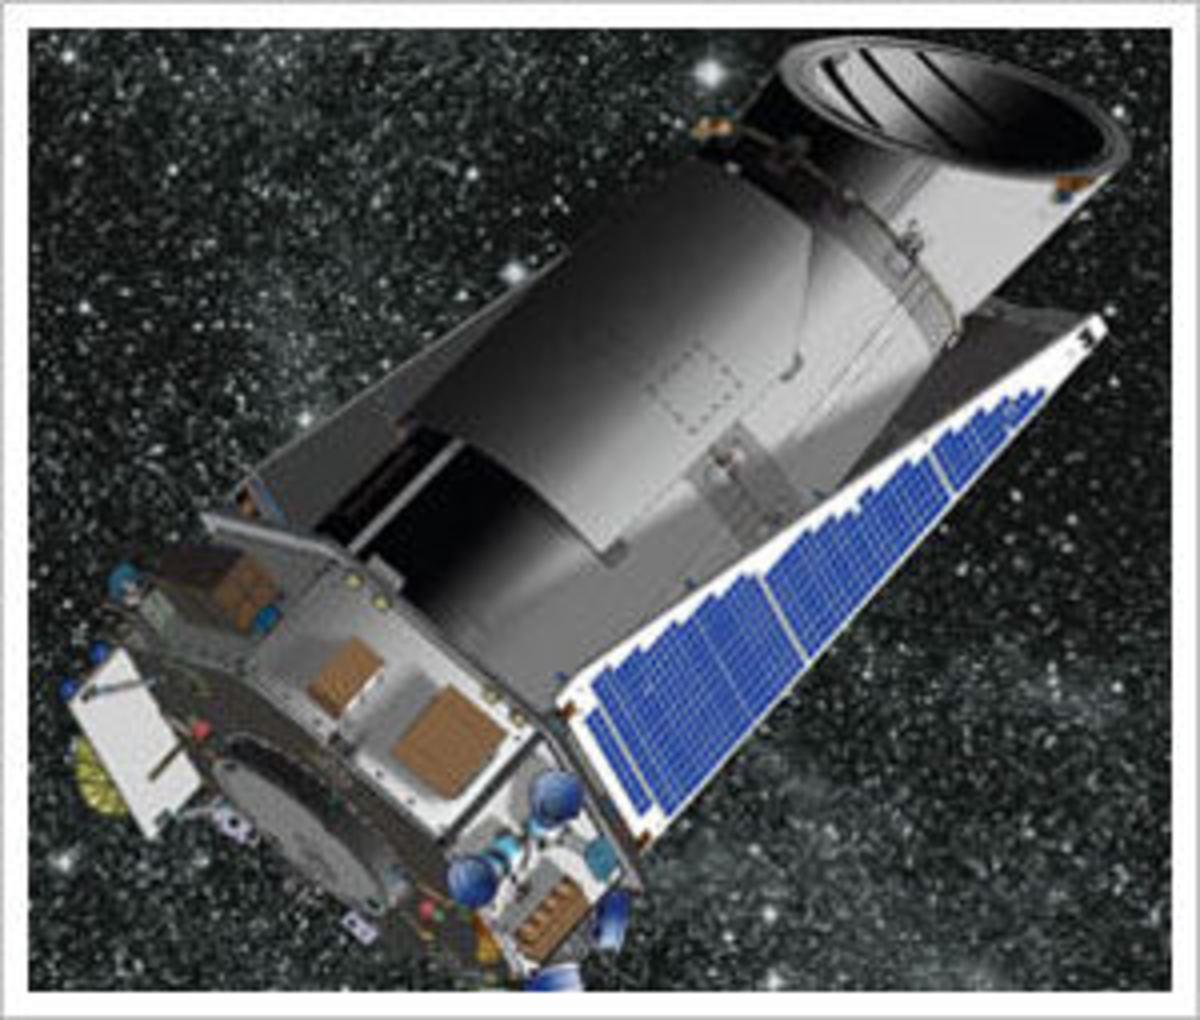 Kepler's Space Telescope will replace Hubble Space telescope